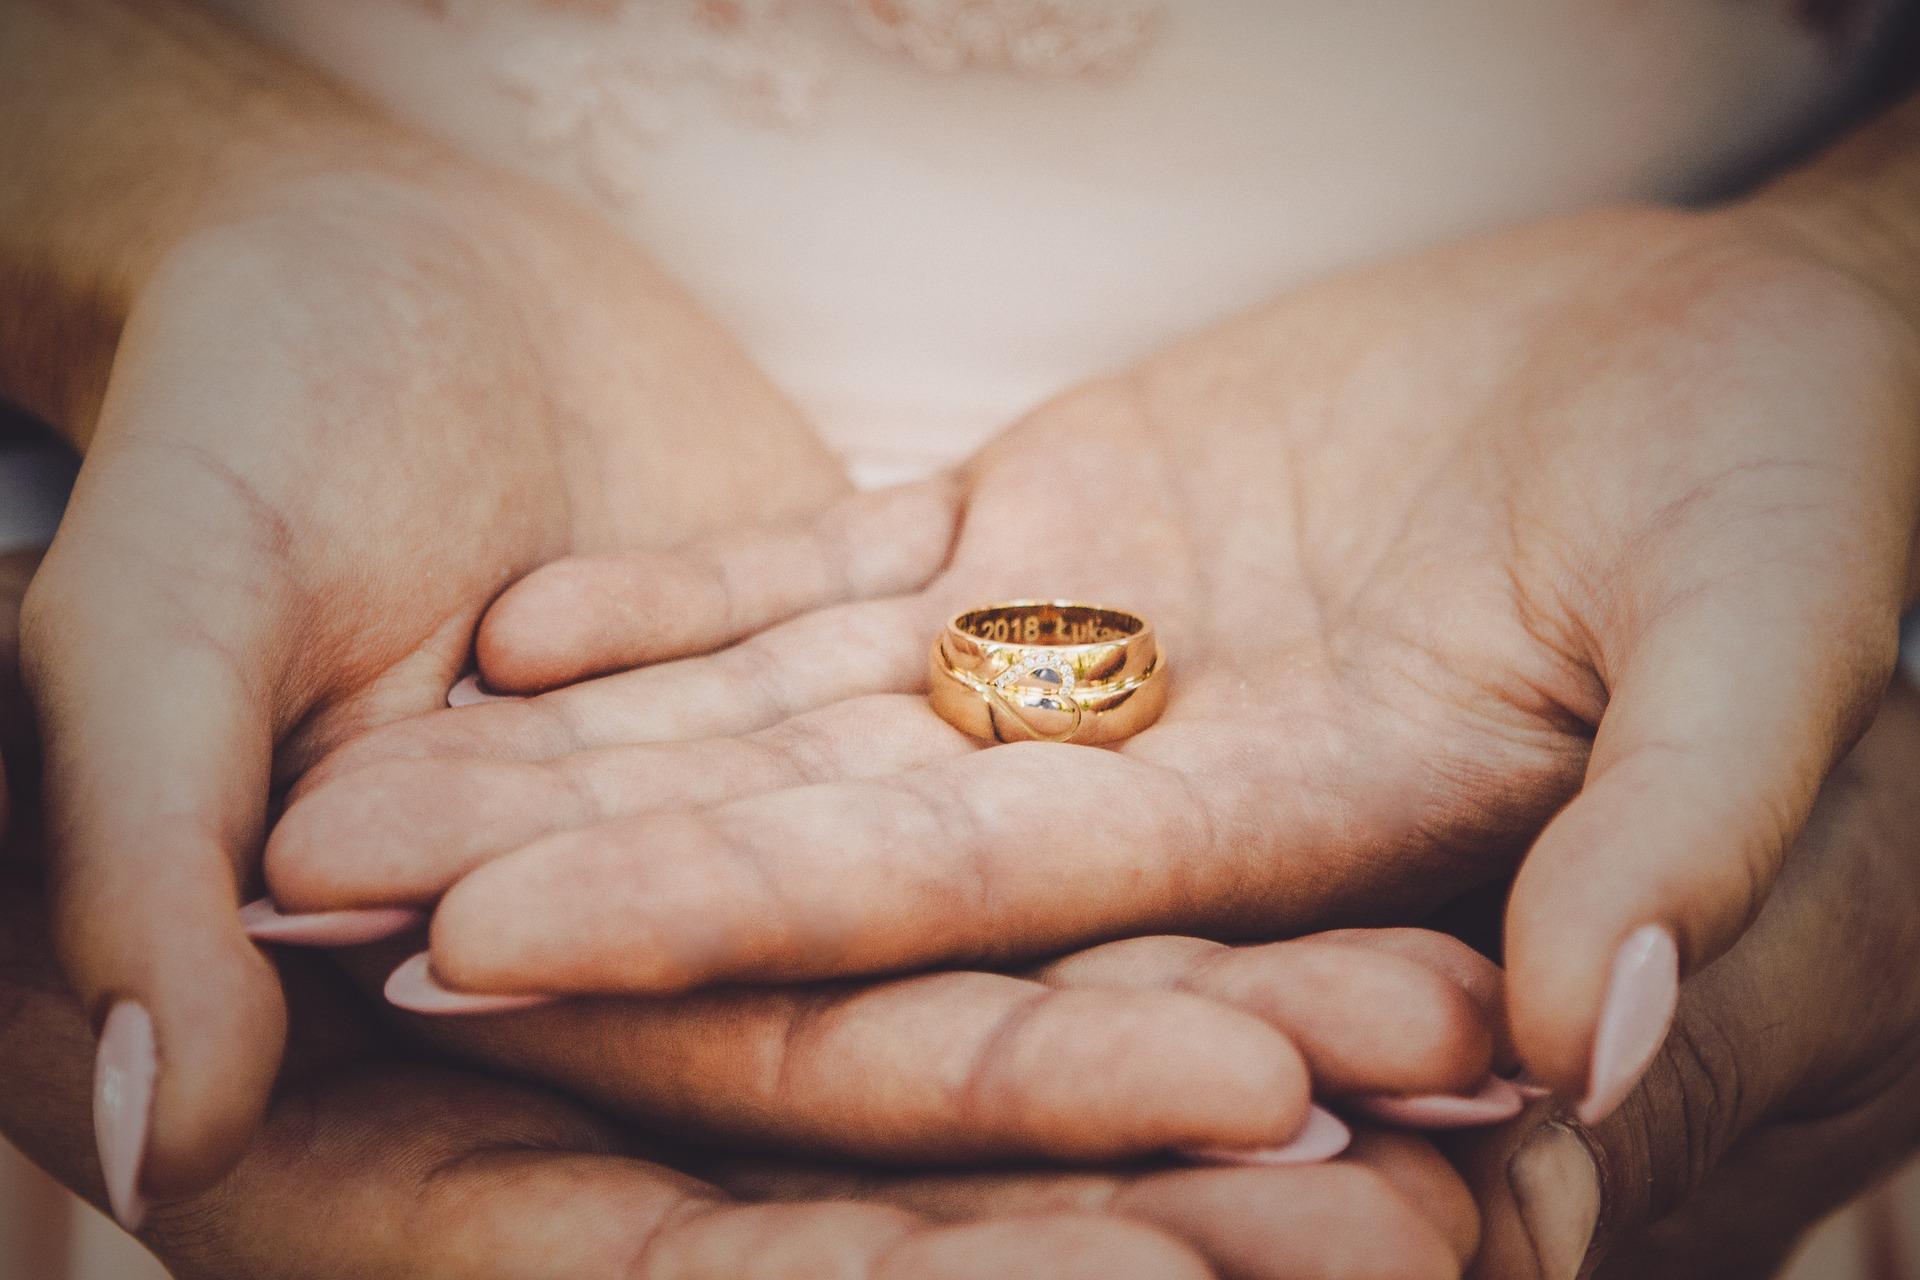 sham marriage conspiracy